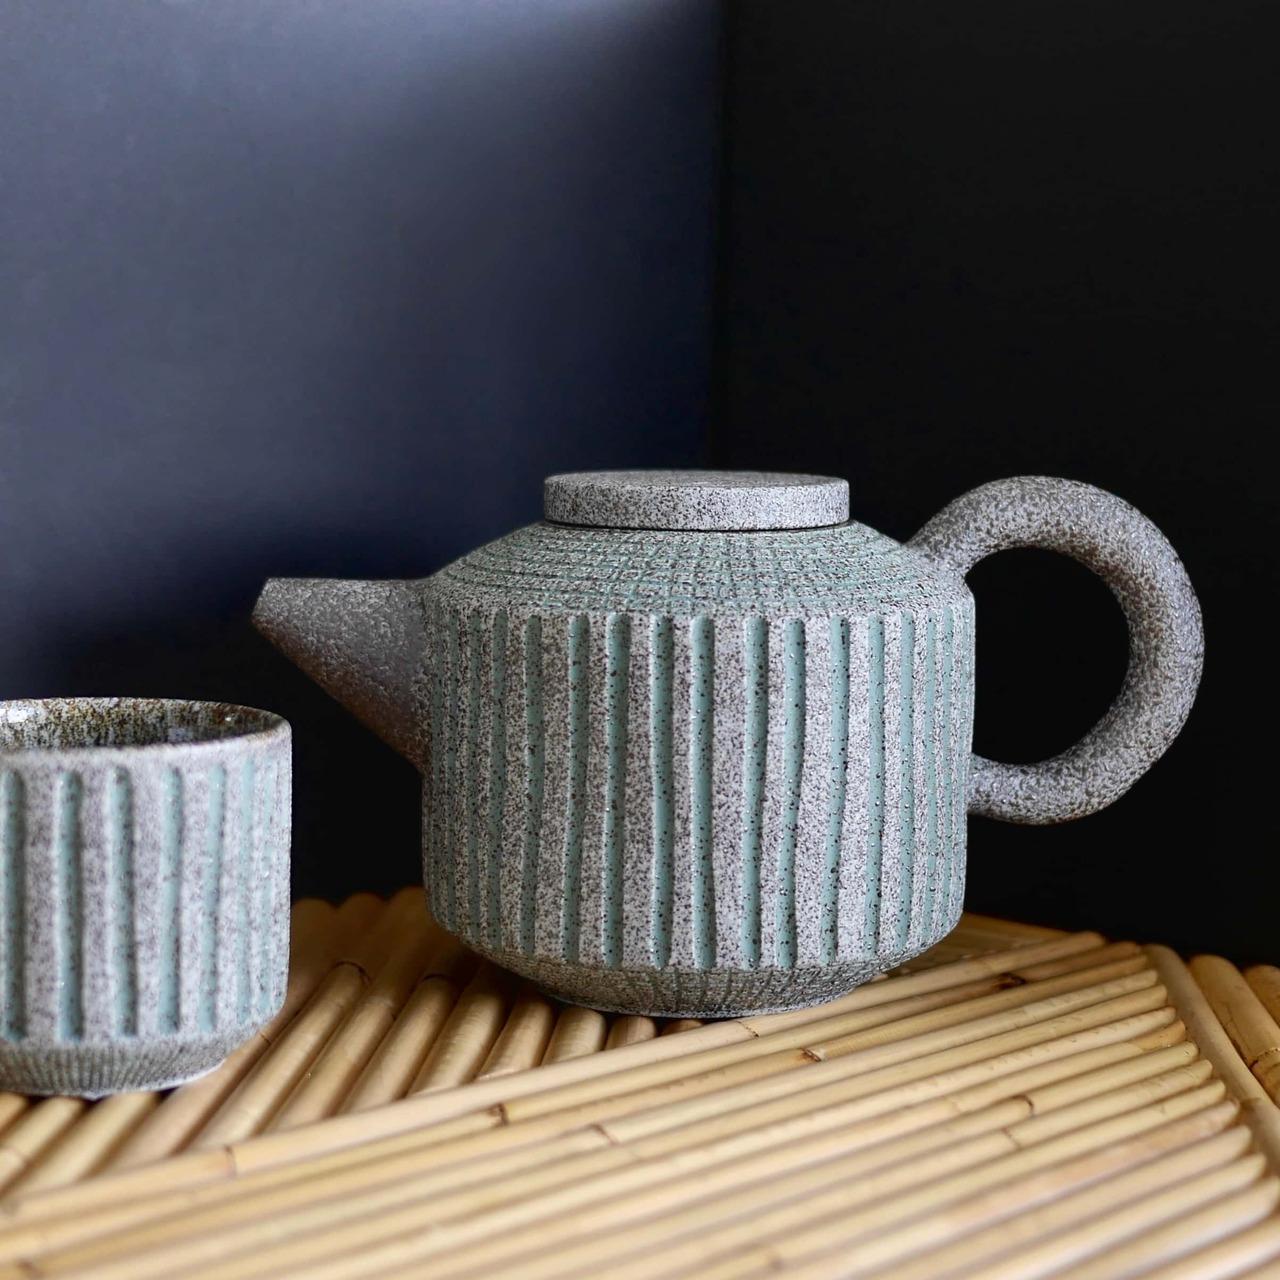 CapKaroso- Ceramic Teapot and cup